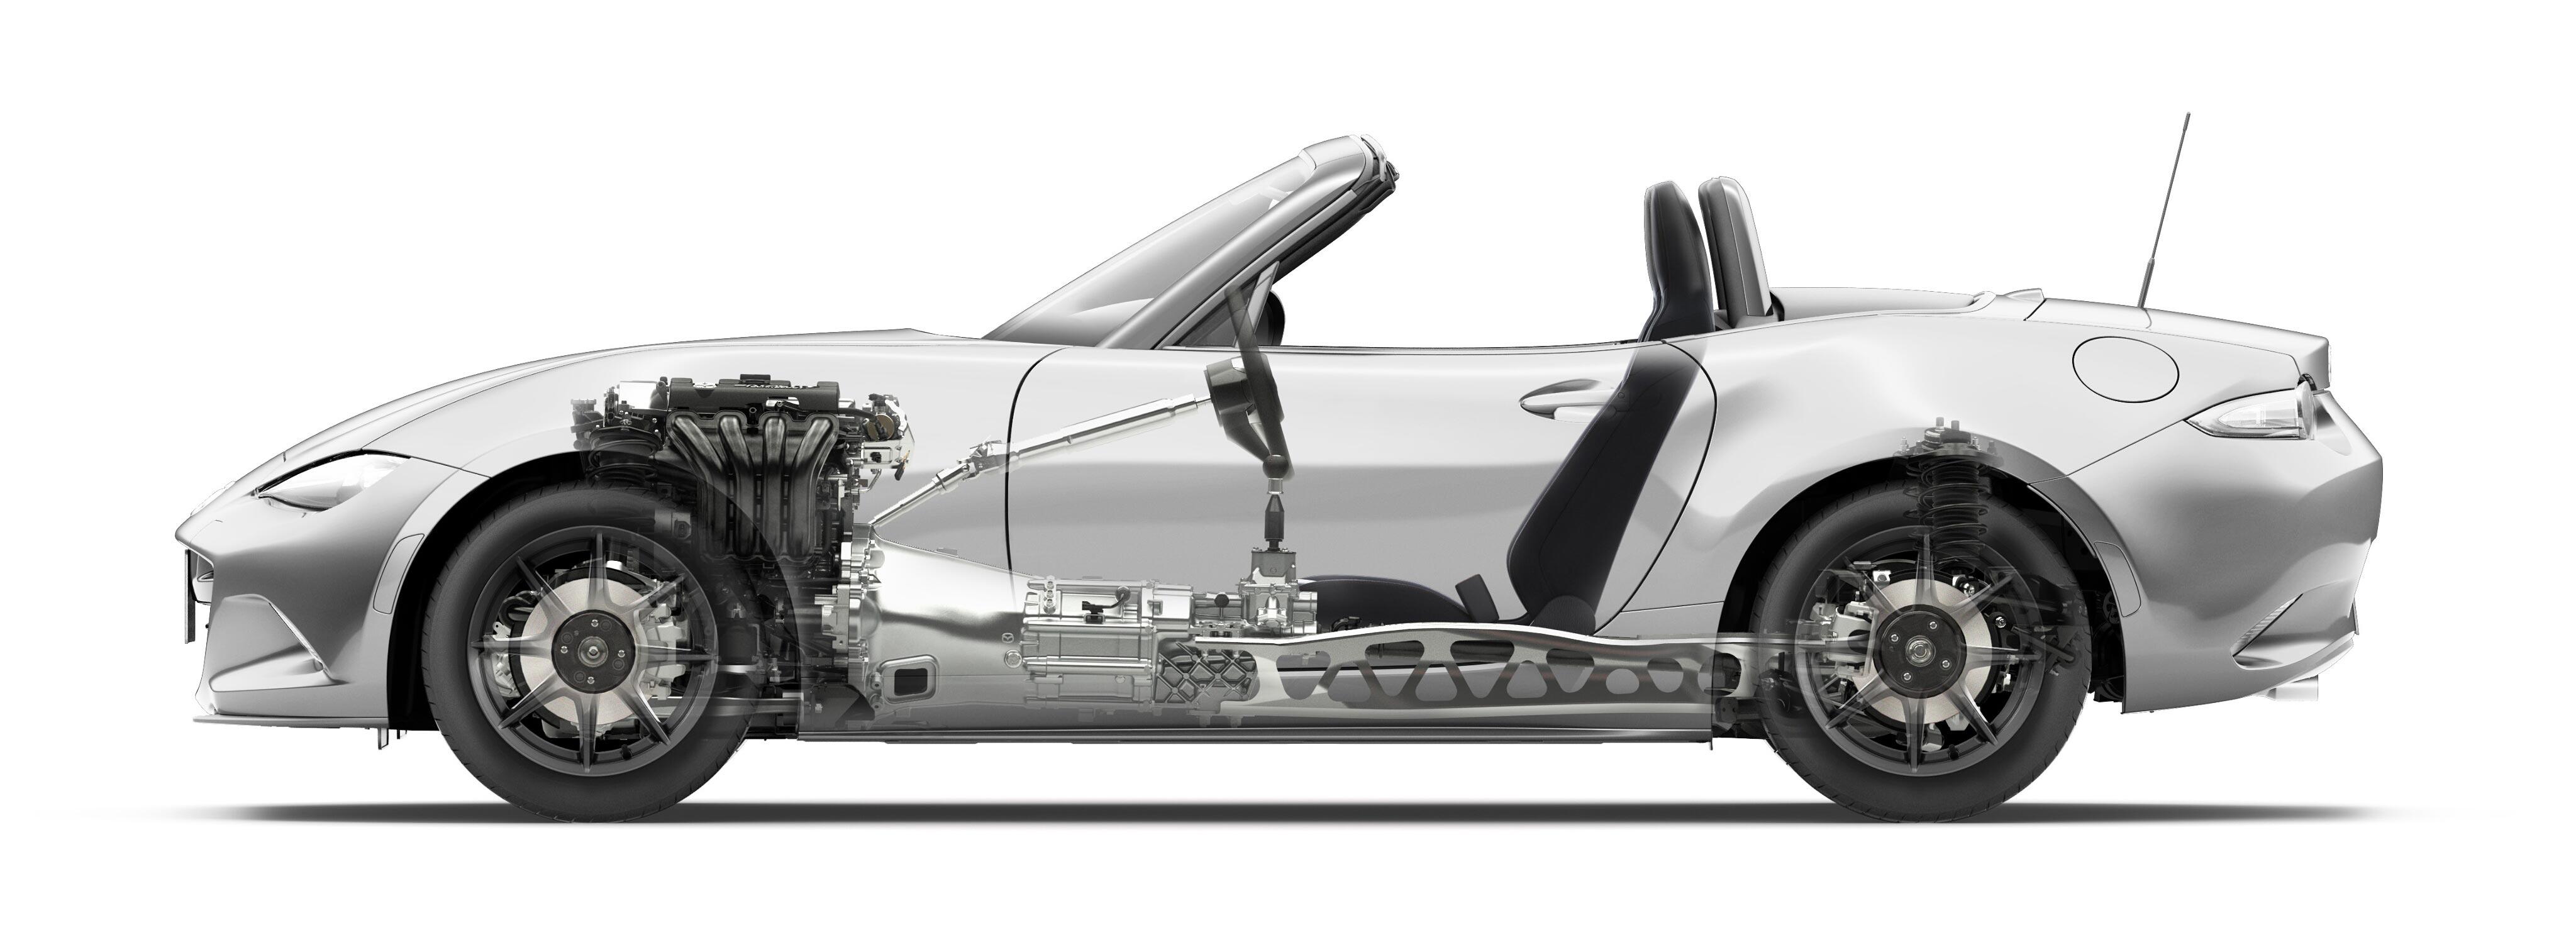 Mazda Roadster cutaway drawing